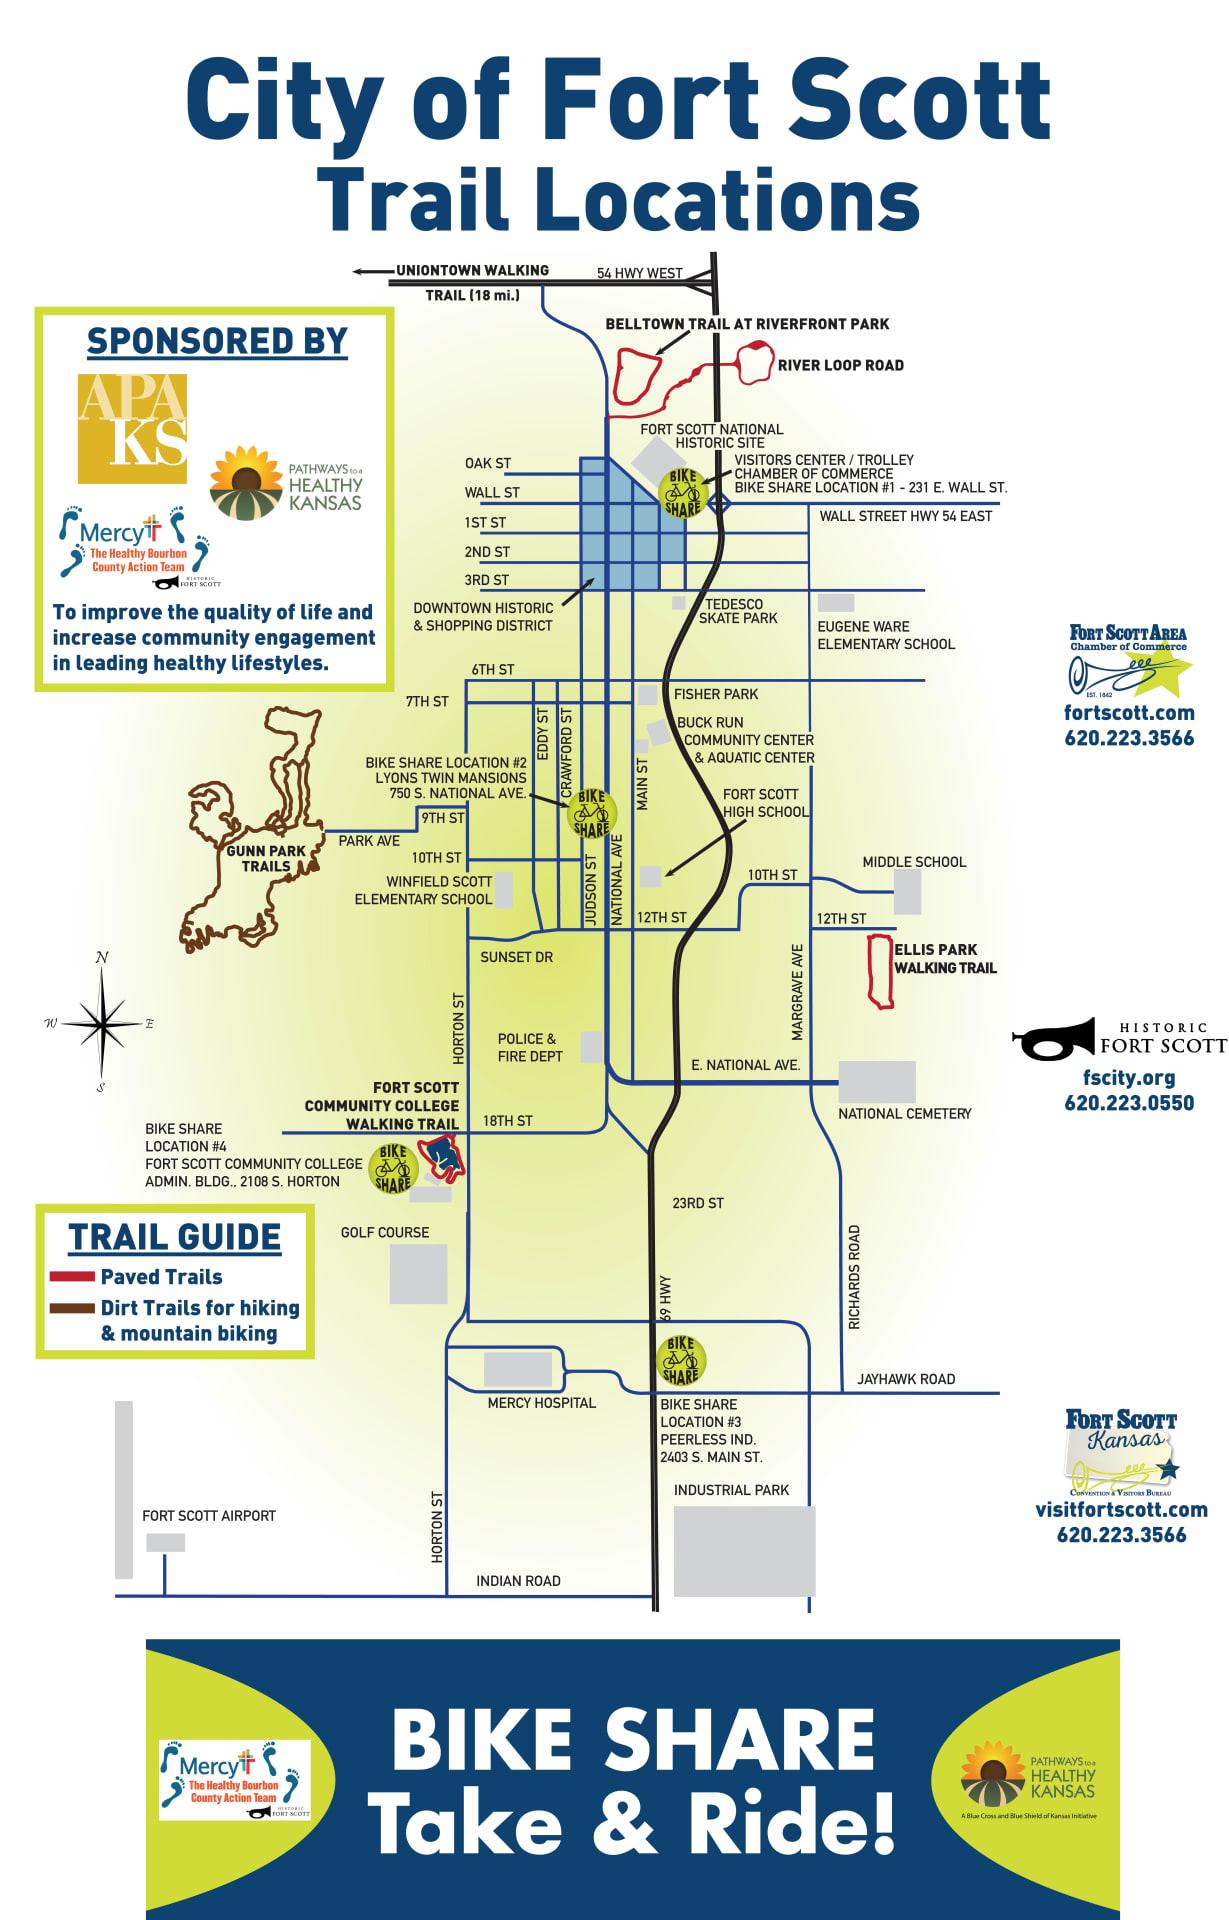 Bike-Share-Locations-Map-Fort-Scott.jpg